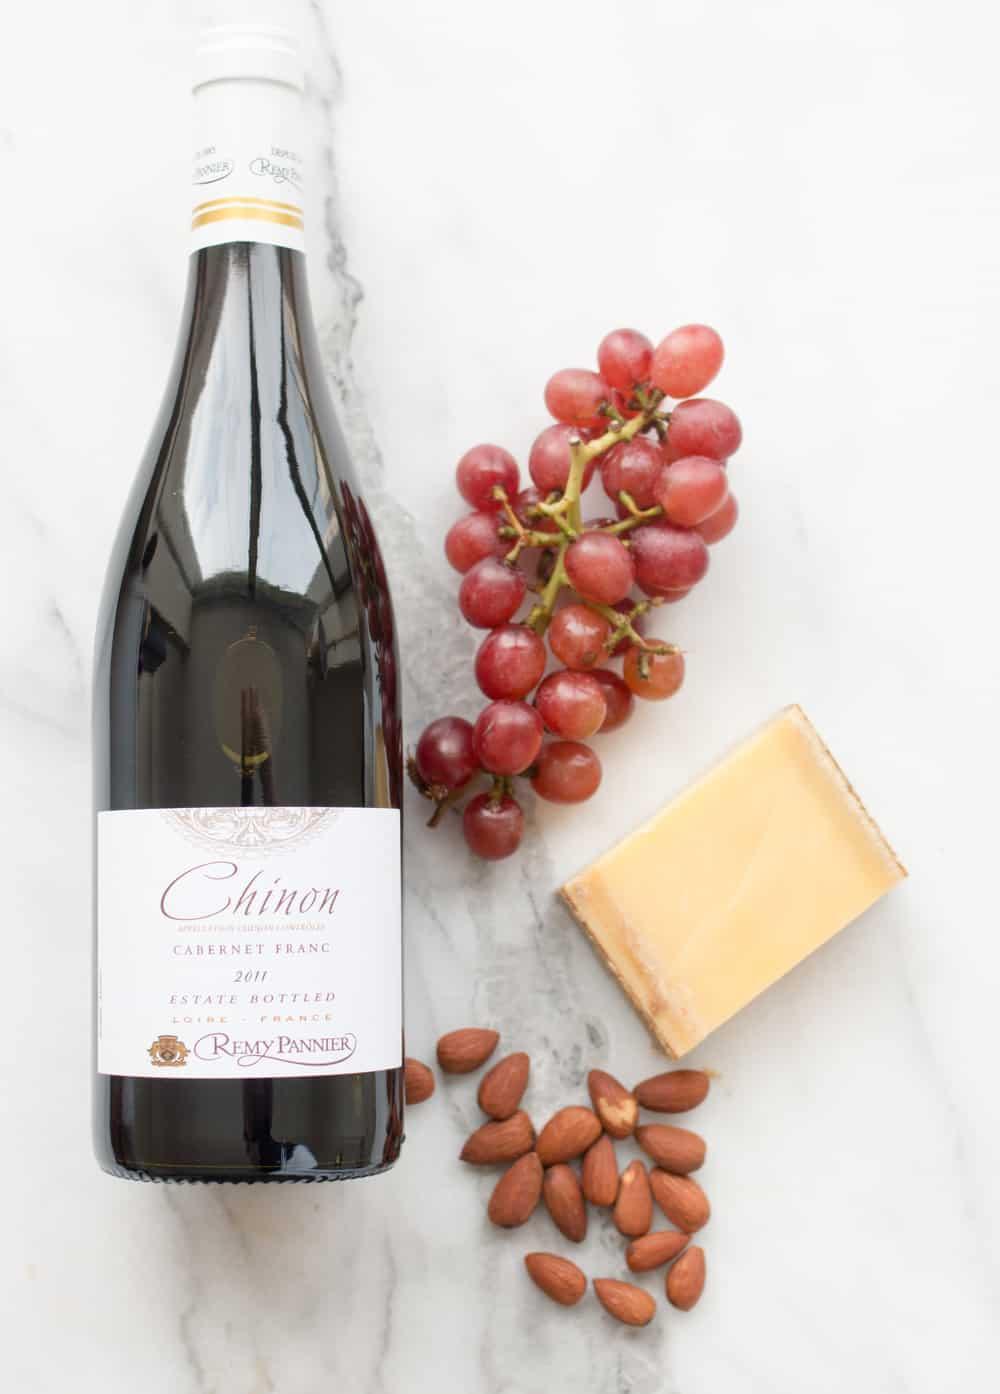 @everydayparisian @rebeccaplotnick french wine post